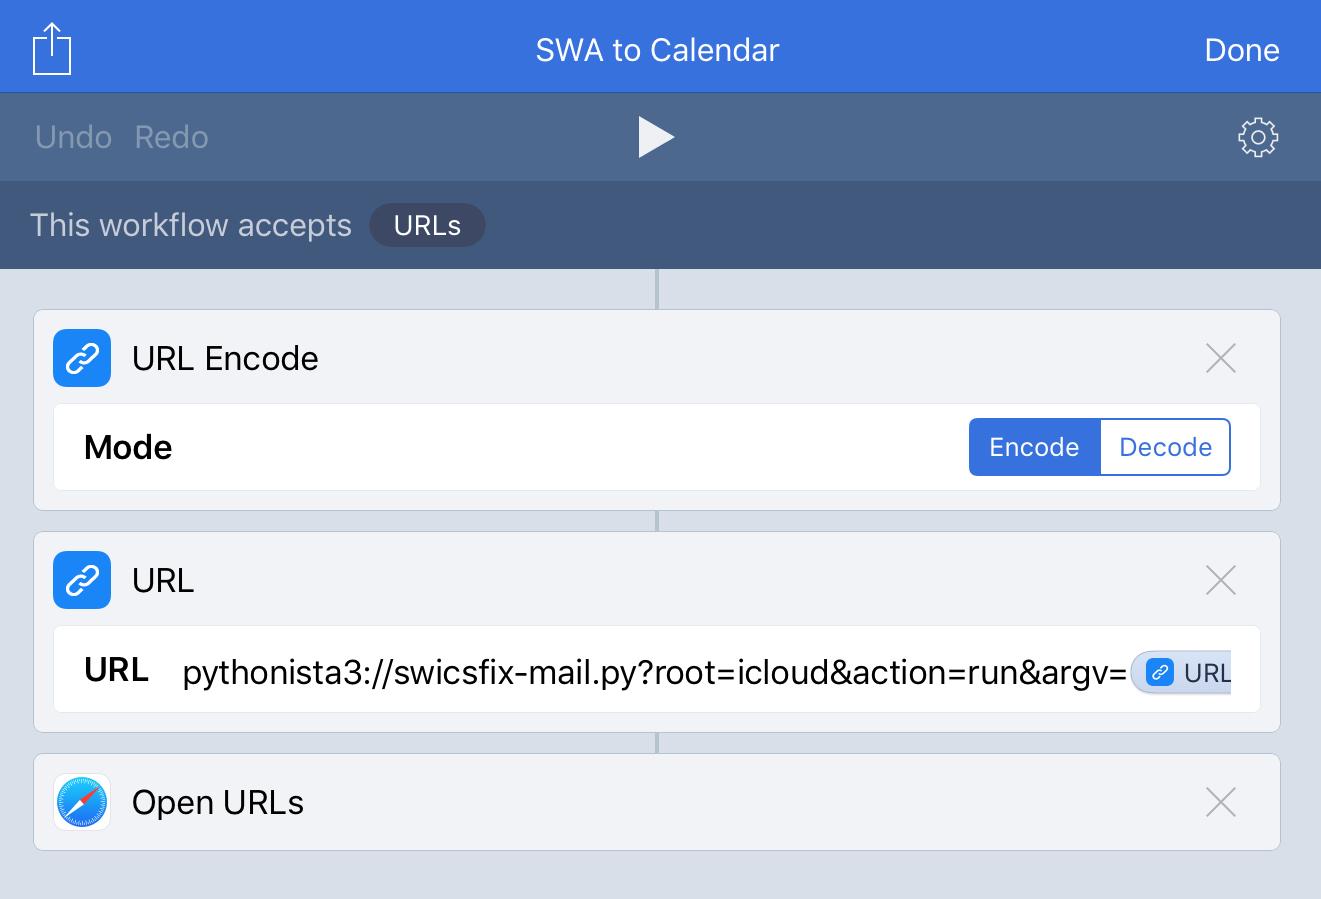 SWA to Calendar workflow